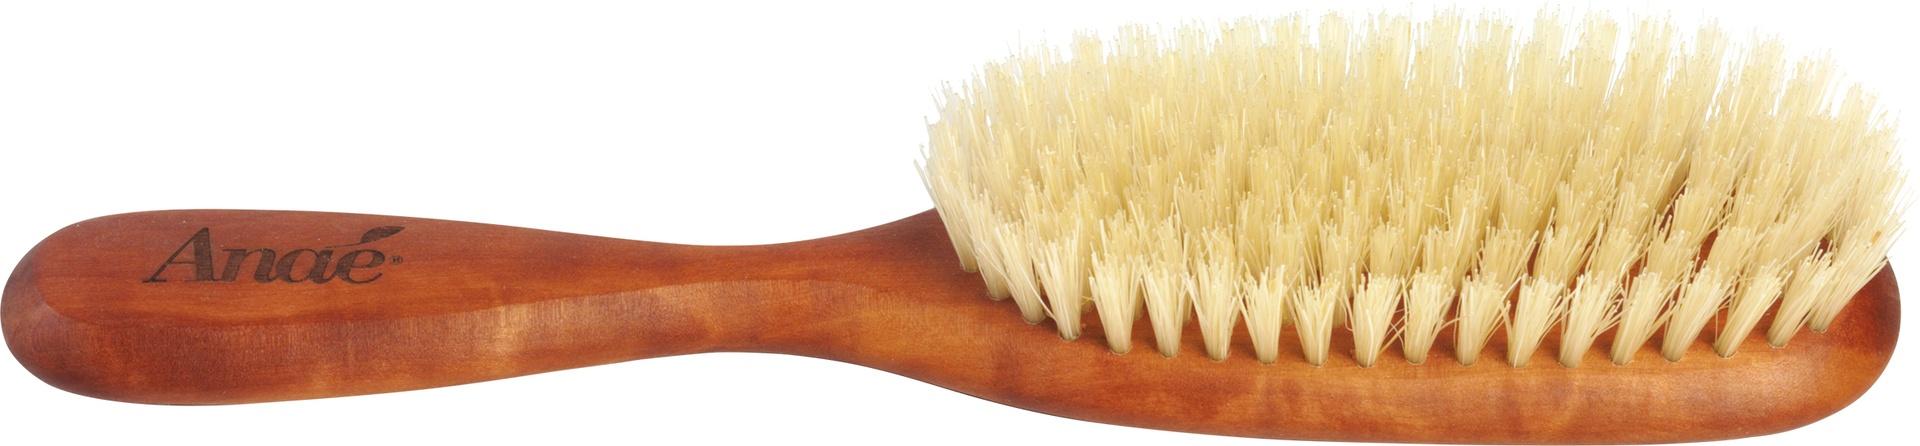 Biologische Anae Haarborstel breed 1 st